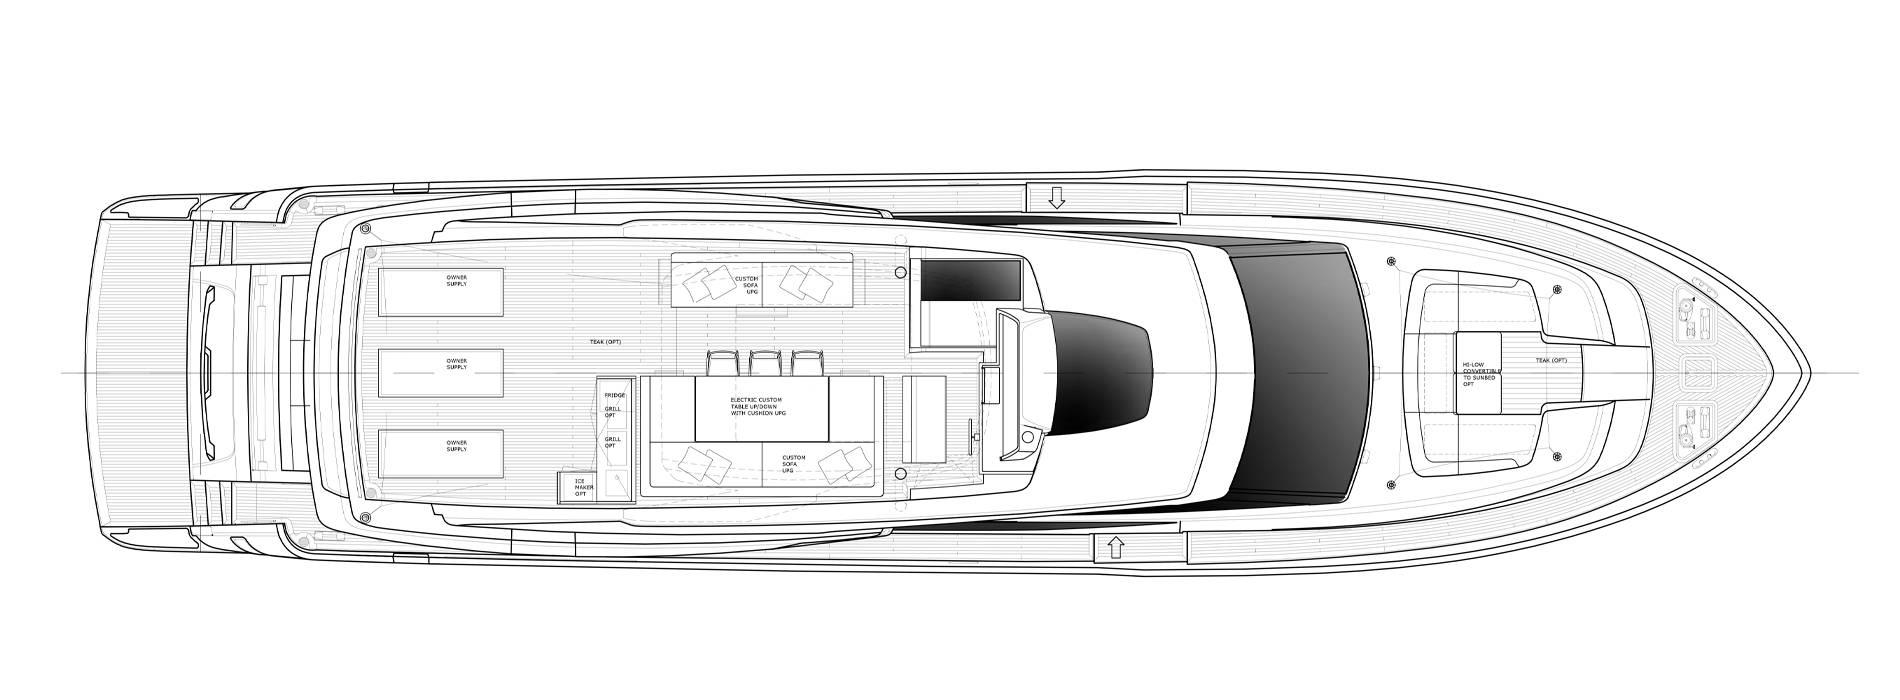 Sanlorenzo Yachts SL86-727 飞桥